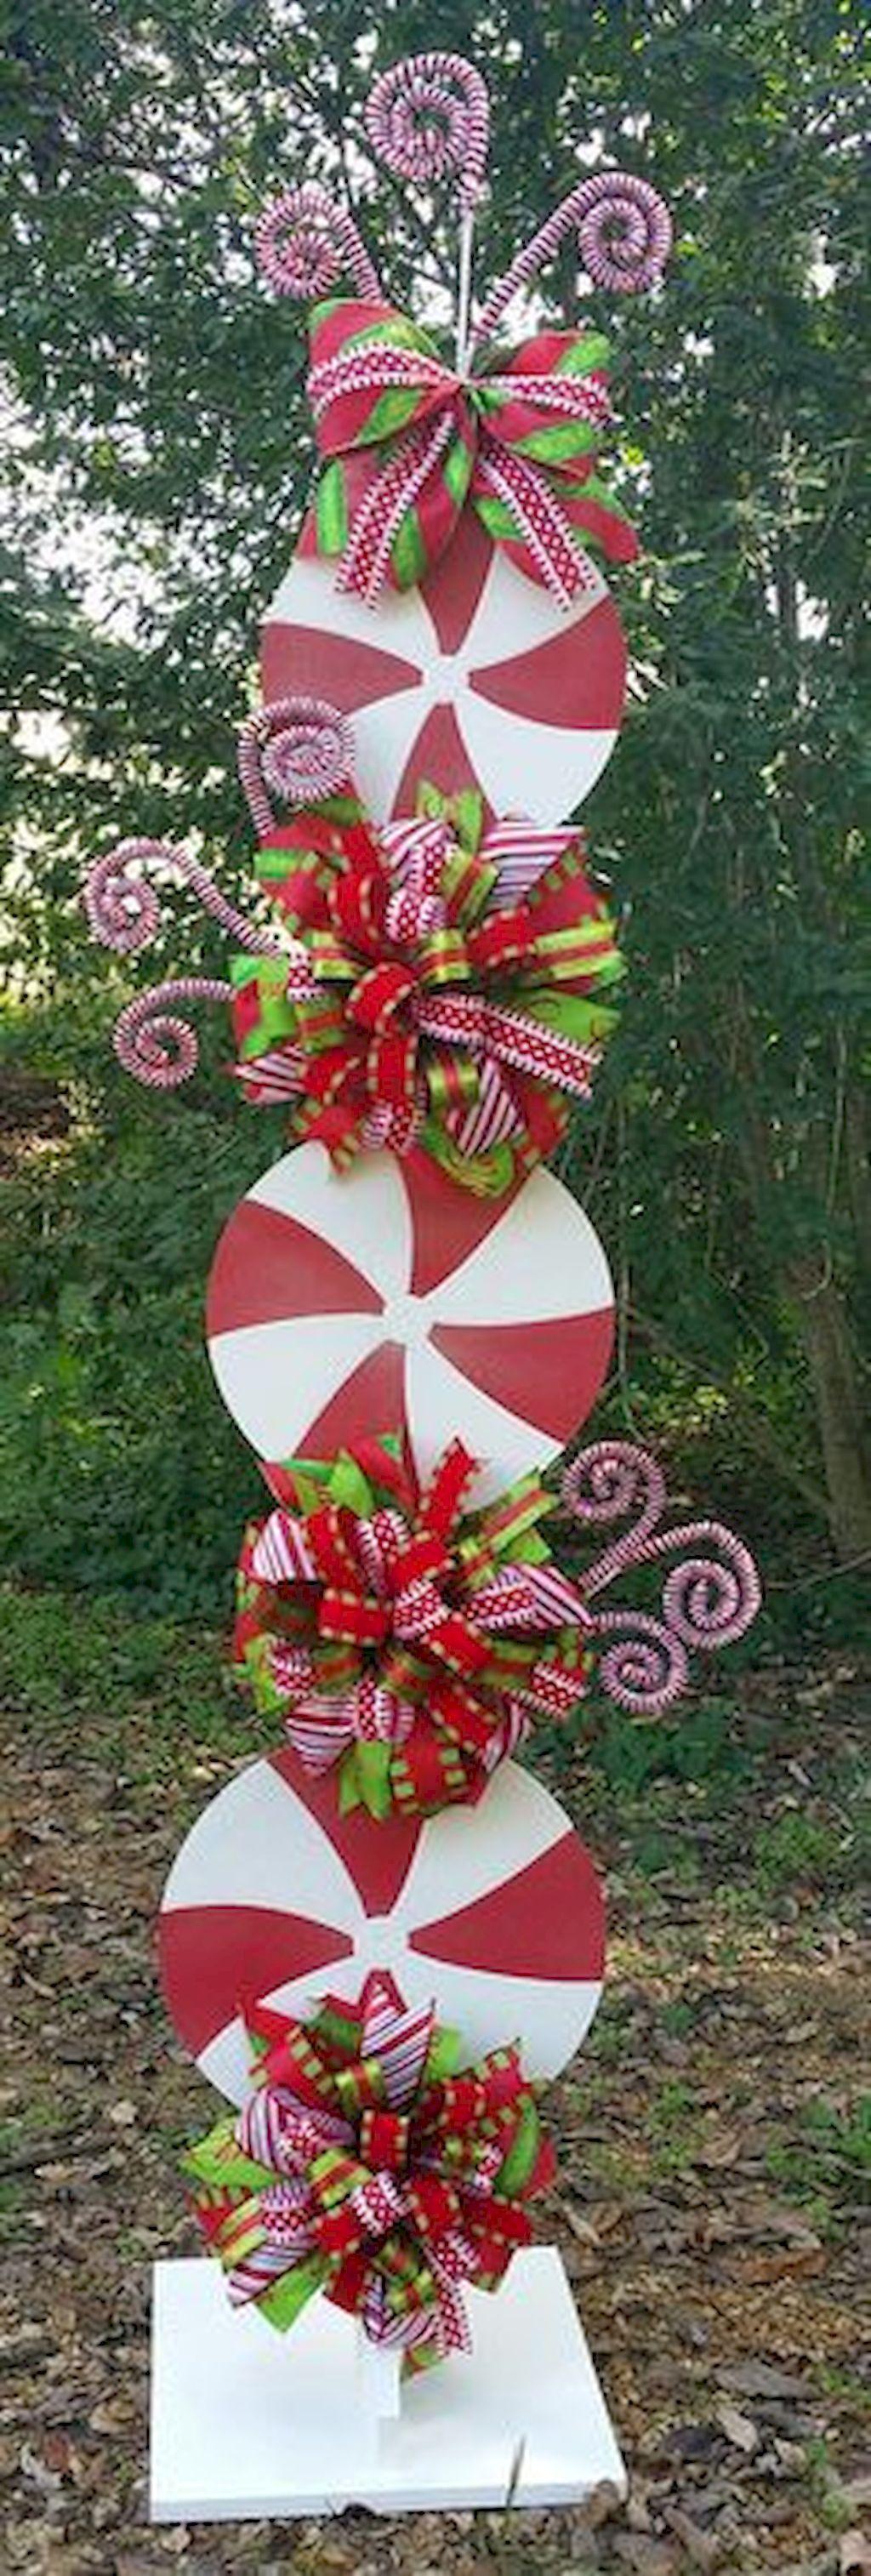 17 Adorable DIY Christmas Craft Ideas -   25 crafts for women ideas